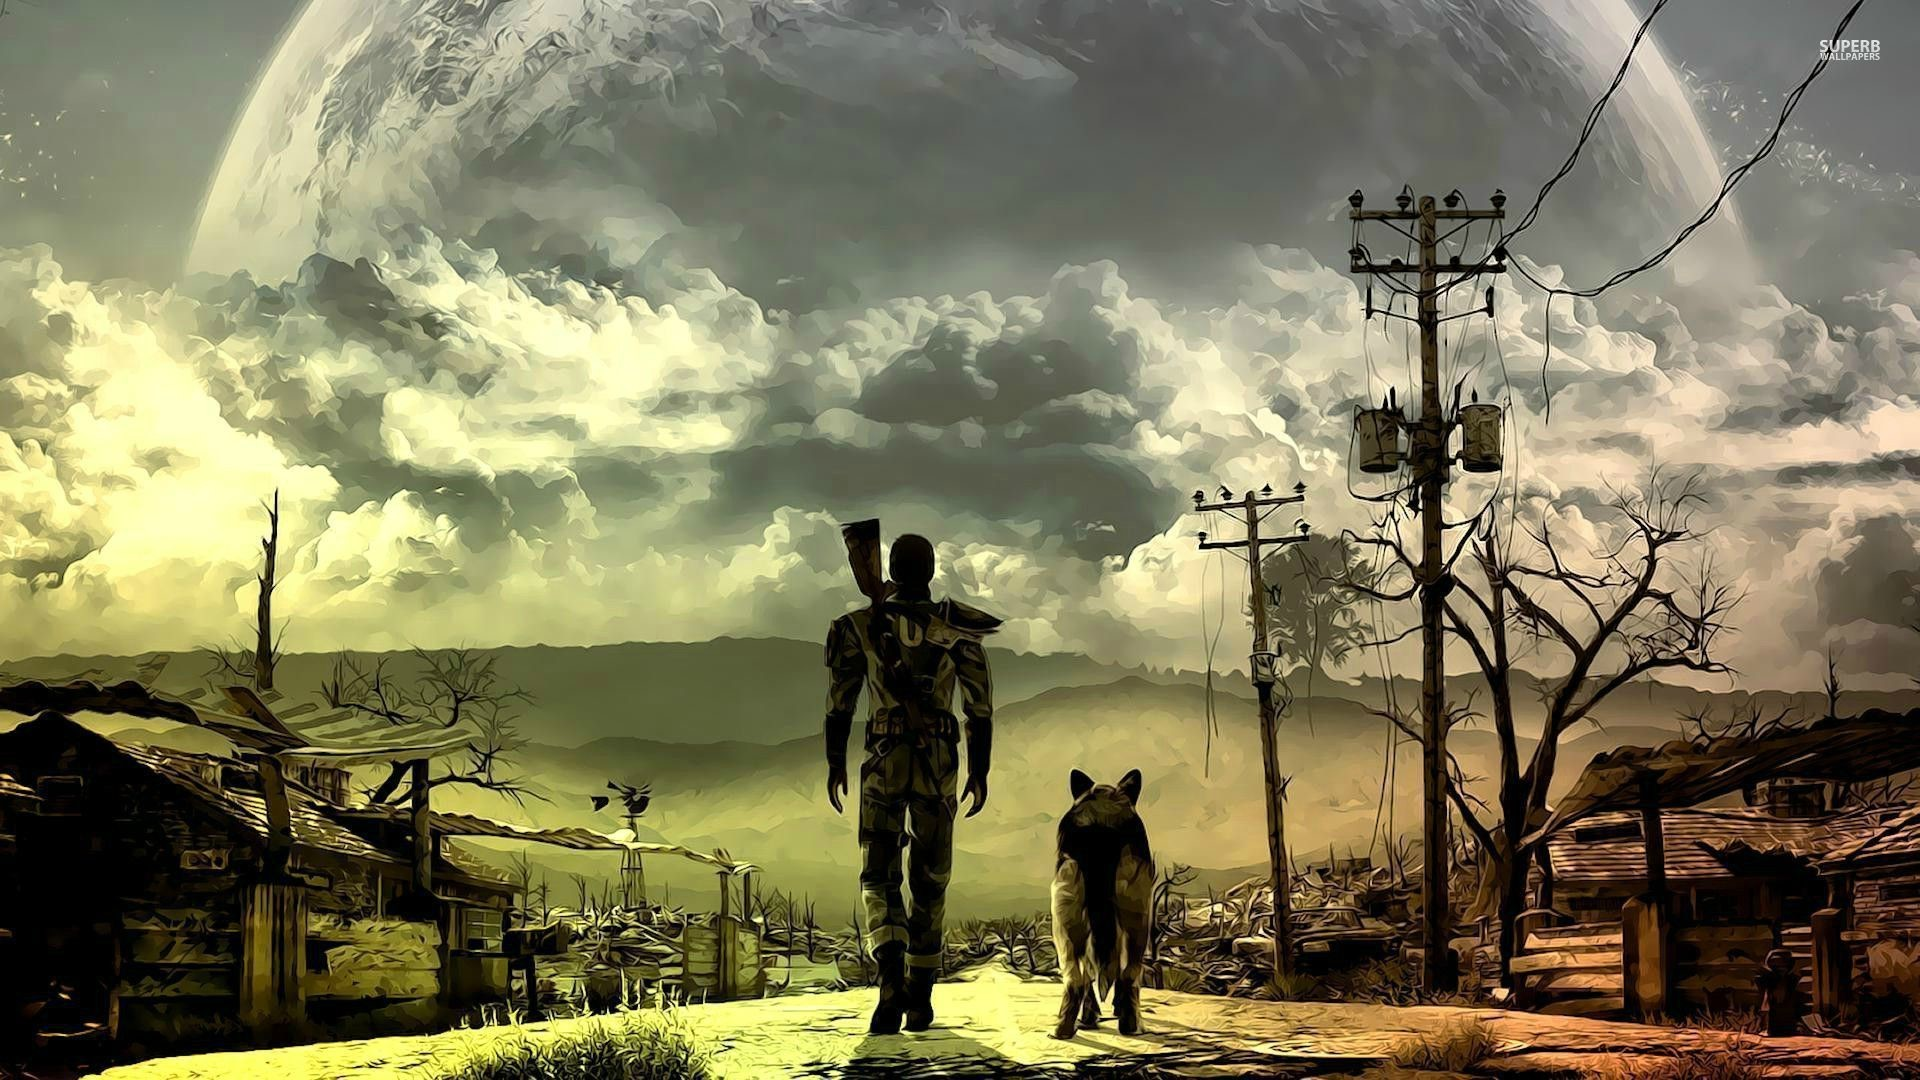 Vault Boy – Fallout wallpaper – Game wallpapers – #27604